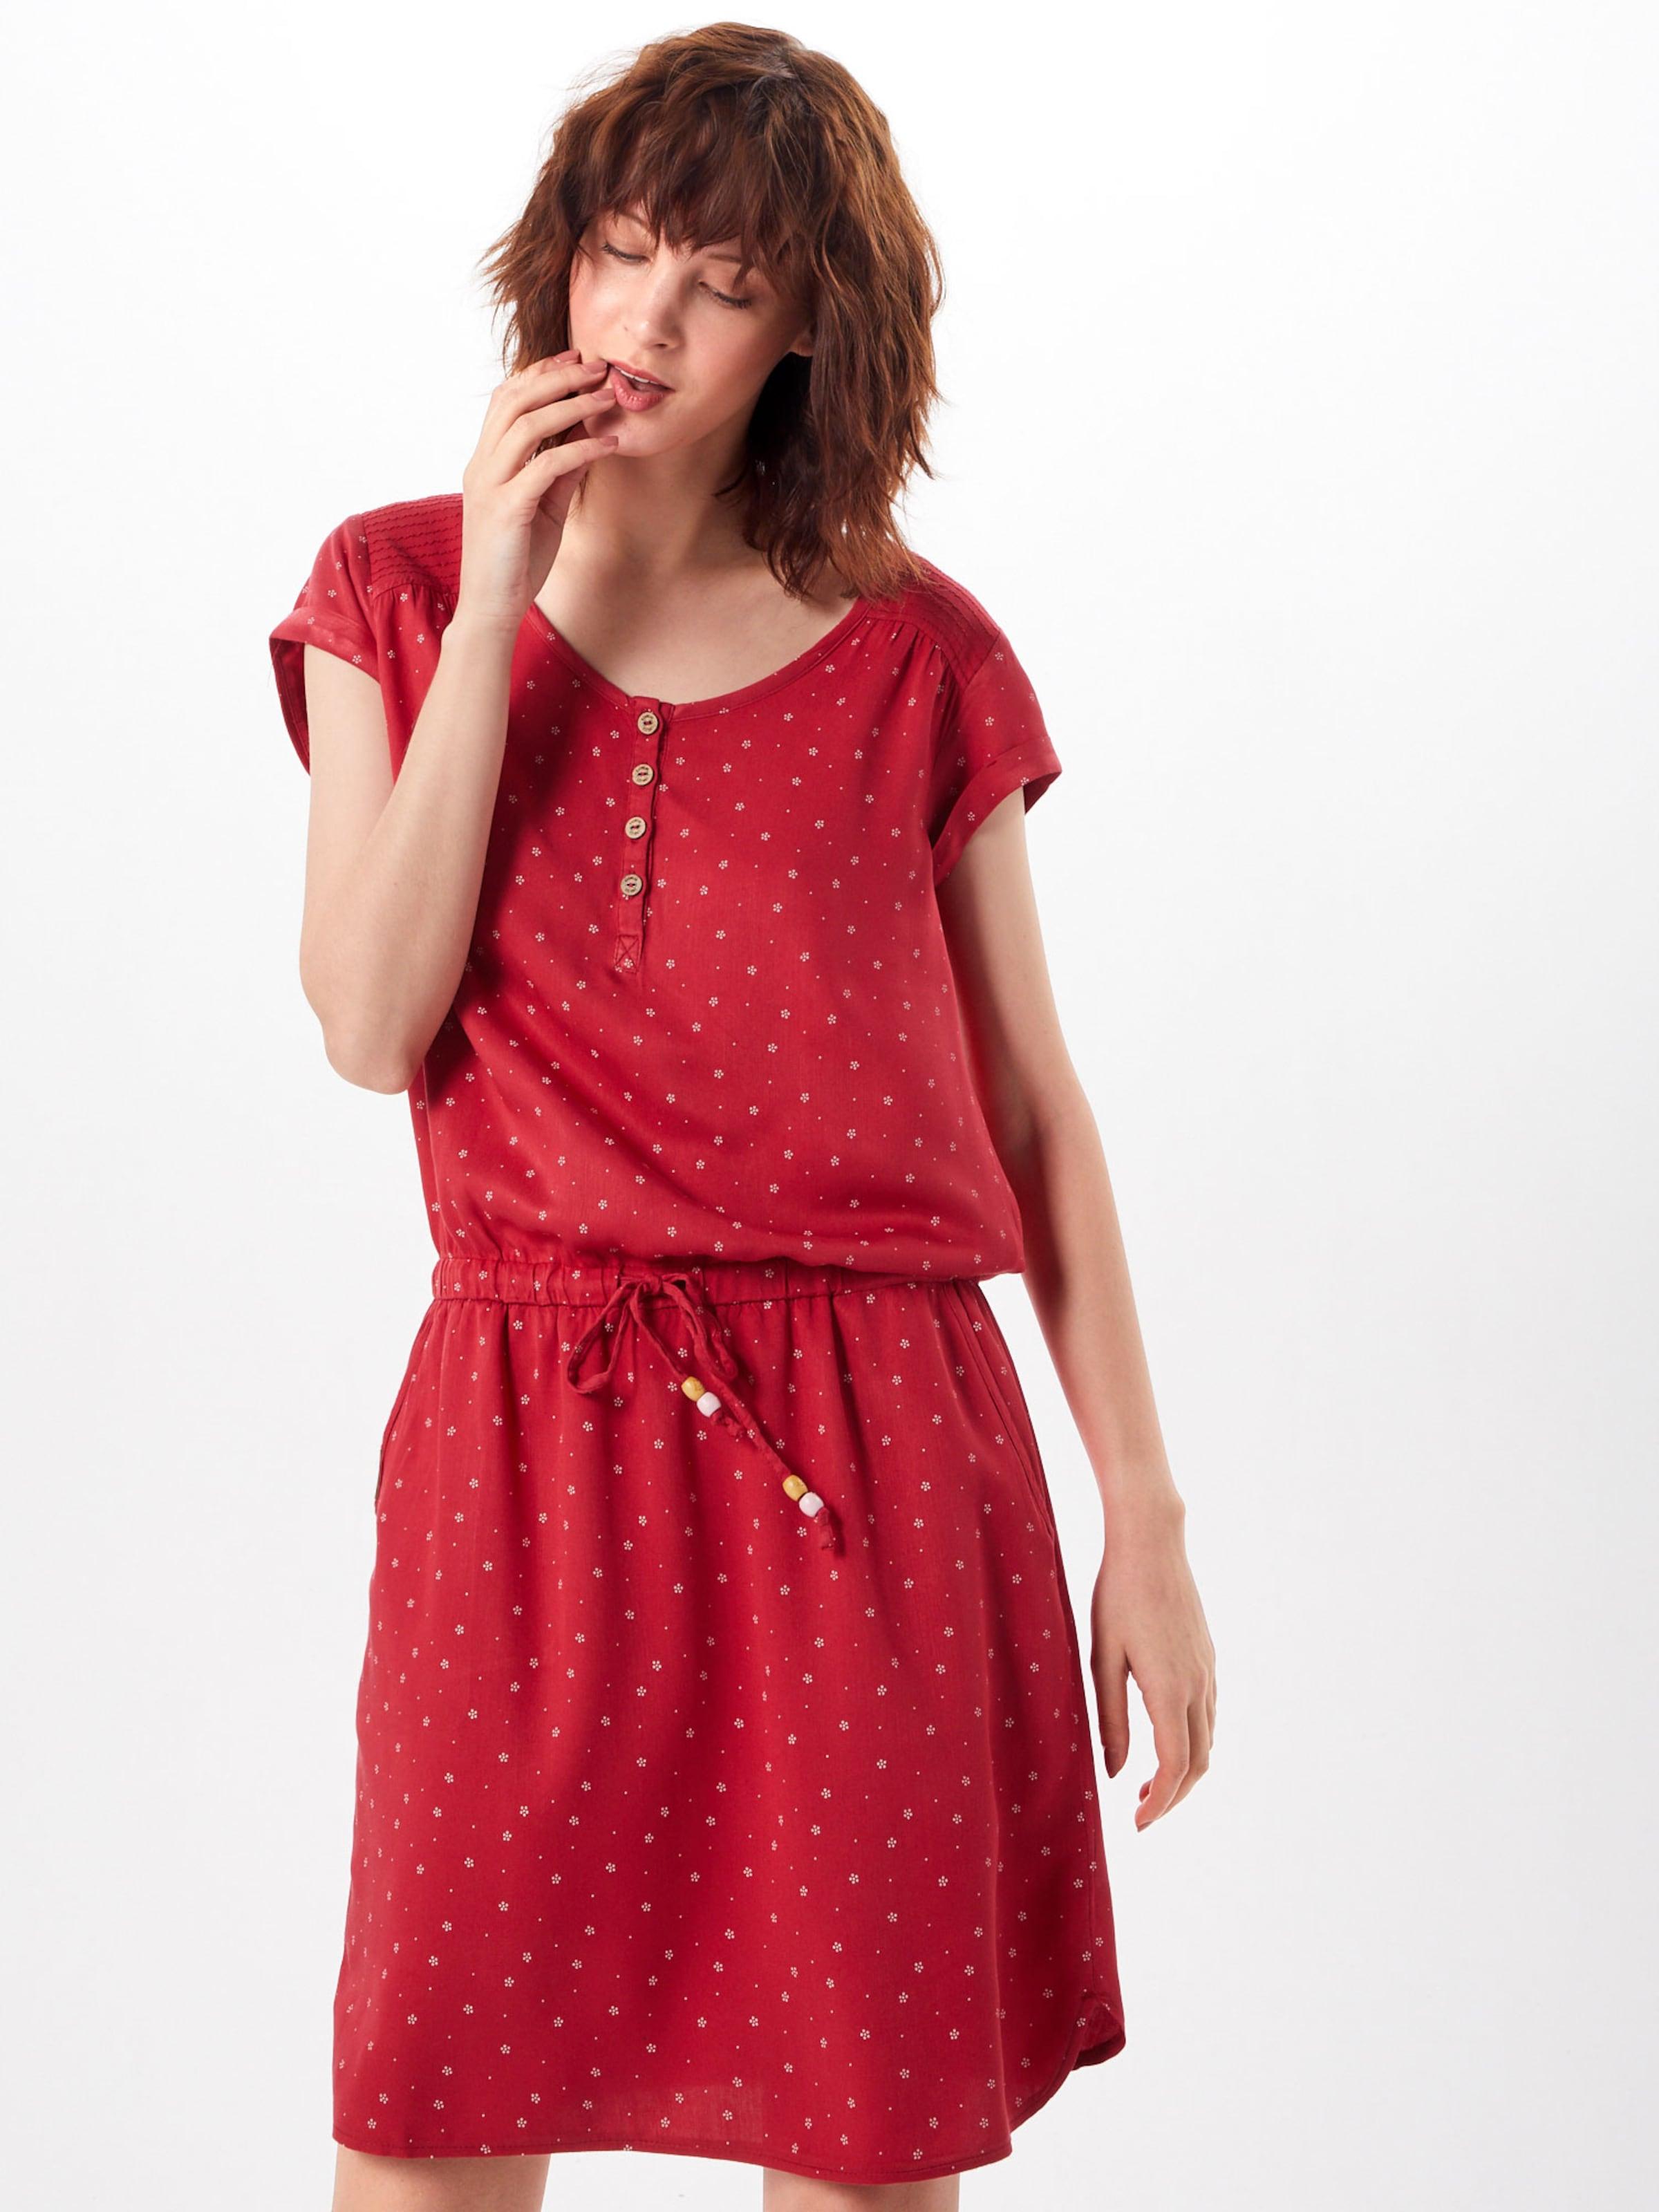 RotWeiß Kleid Ragwear Ragwear In 'danila' 'danila' Kleid In 0PmN8nOvyw